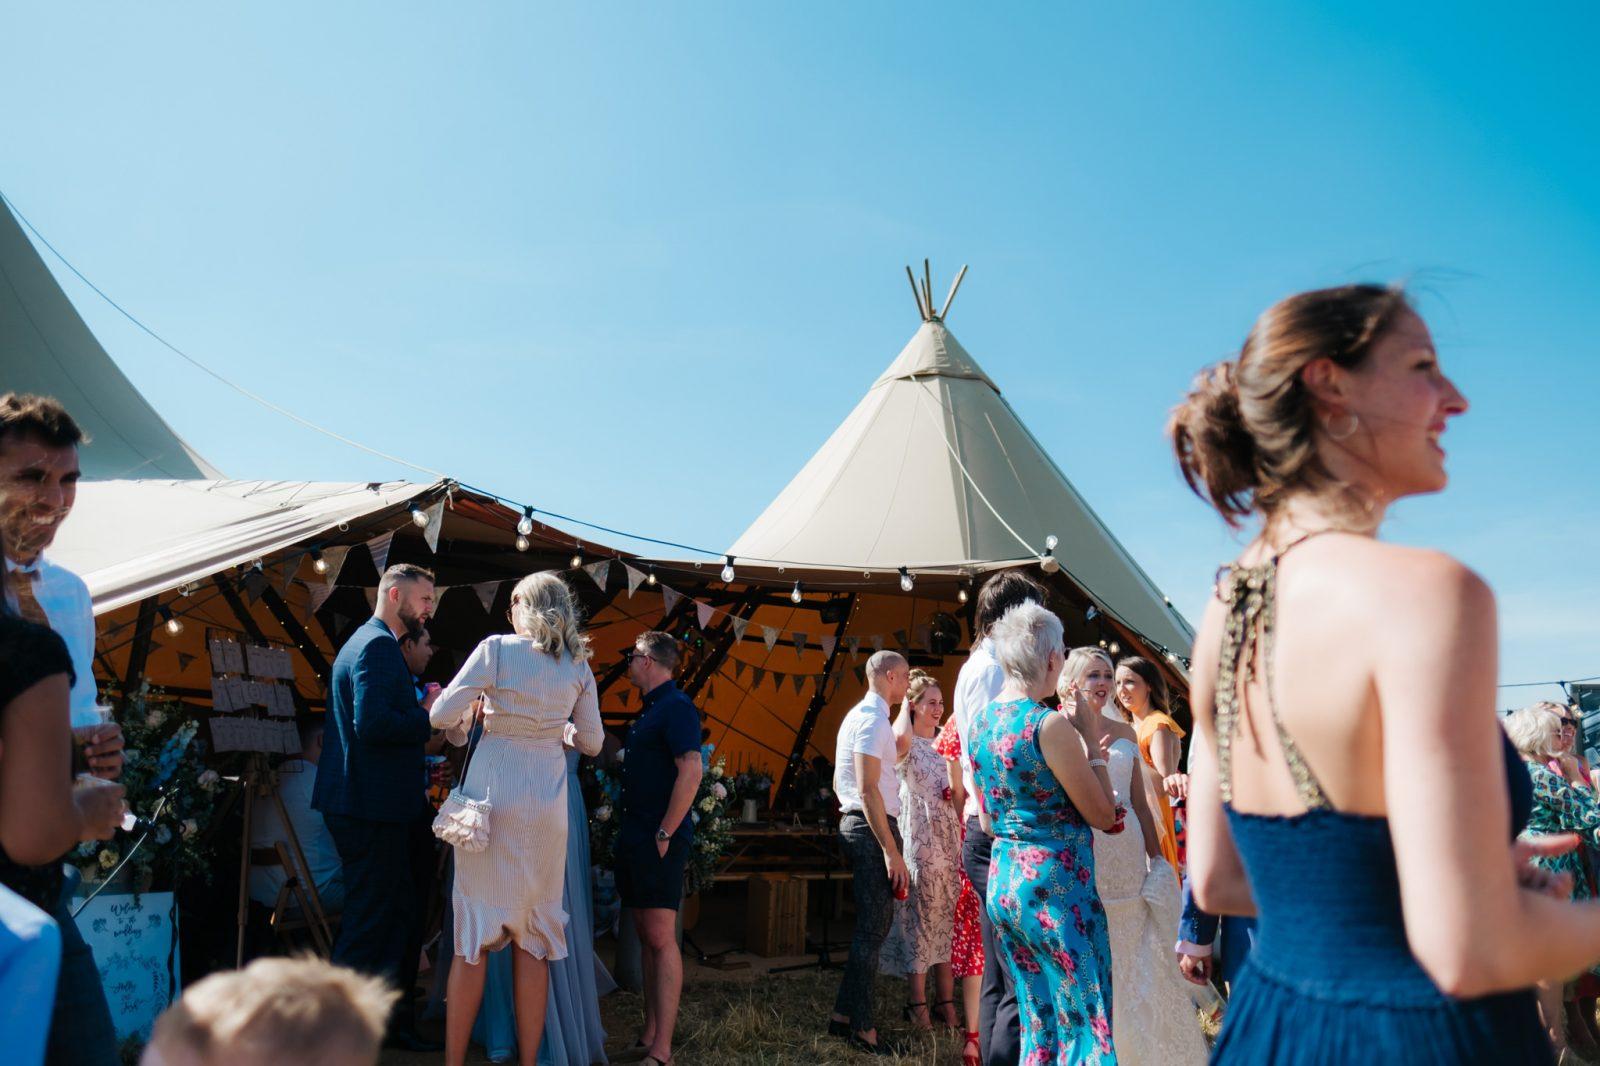 shropshire wedding tipi